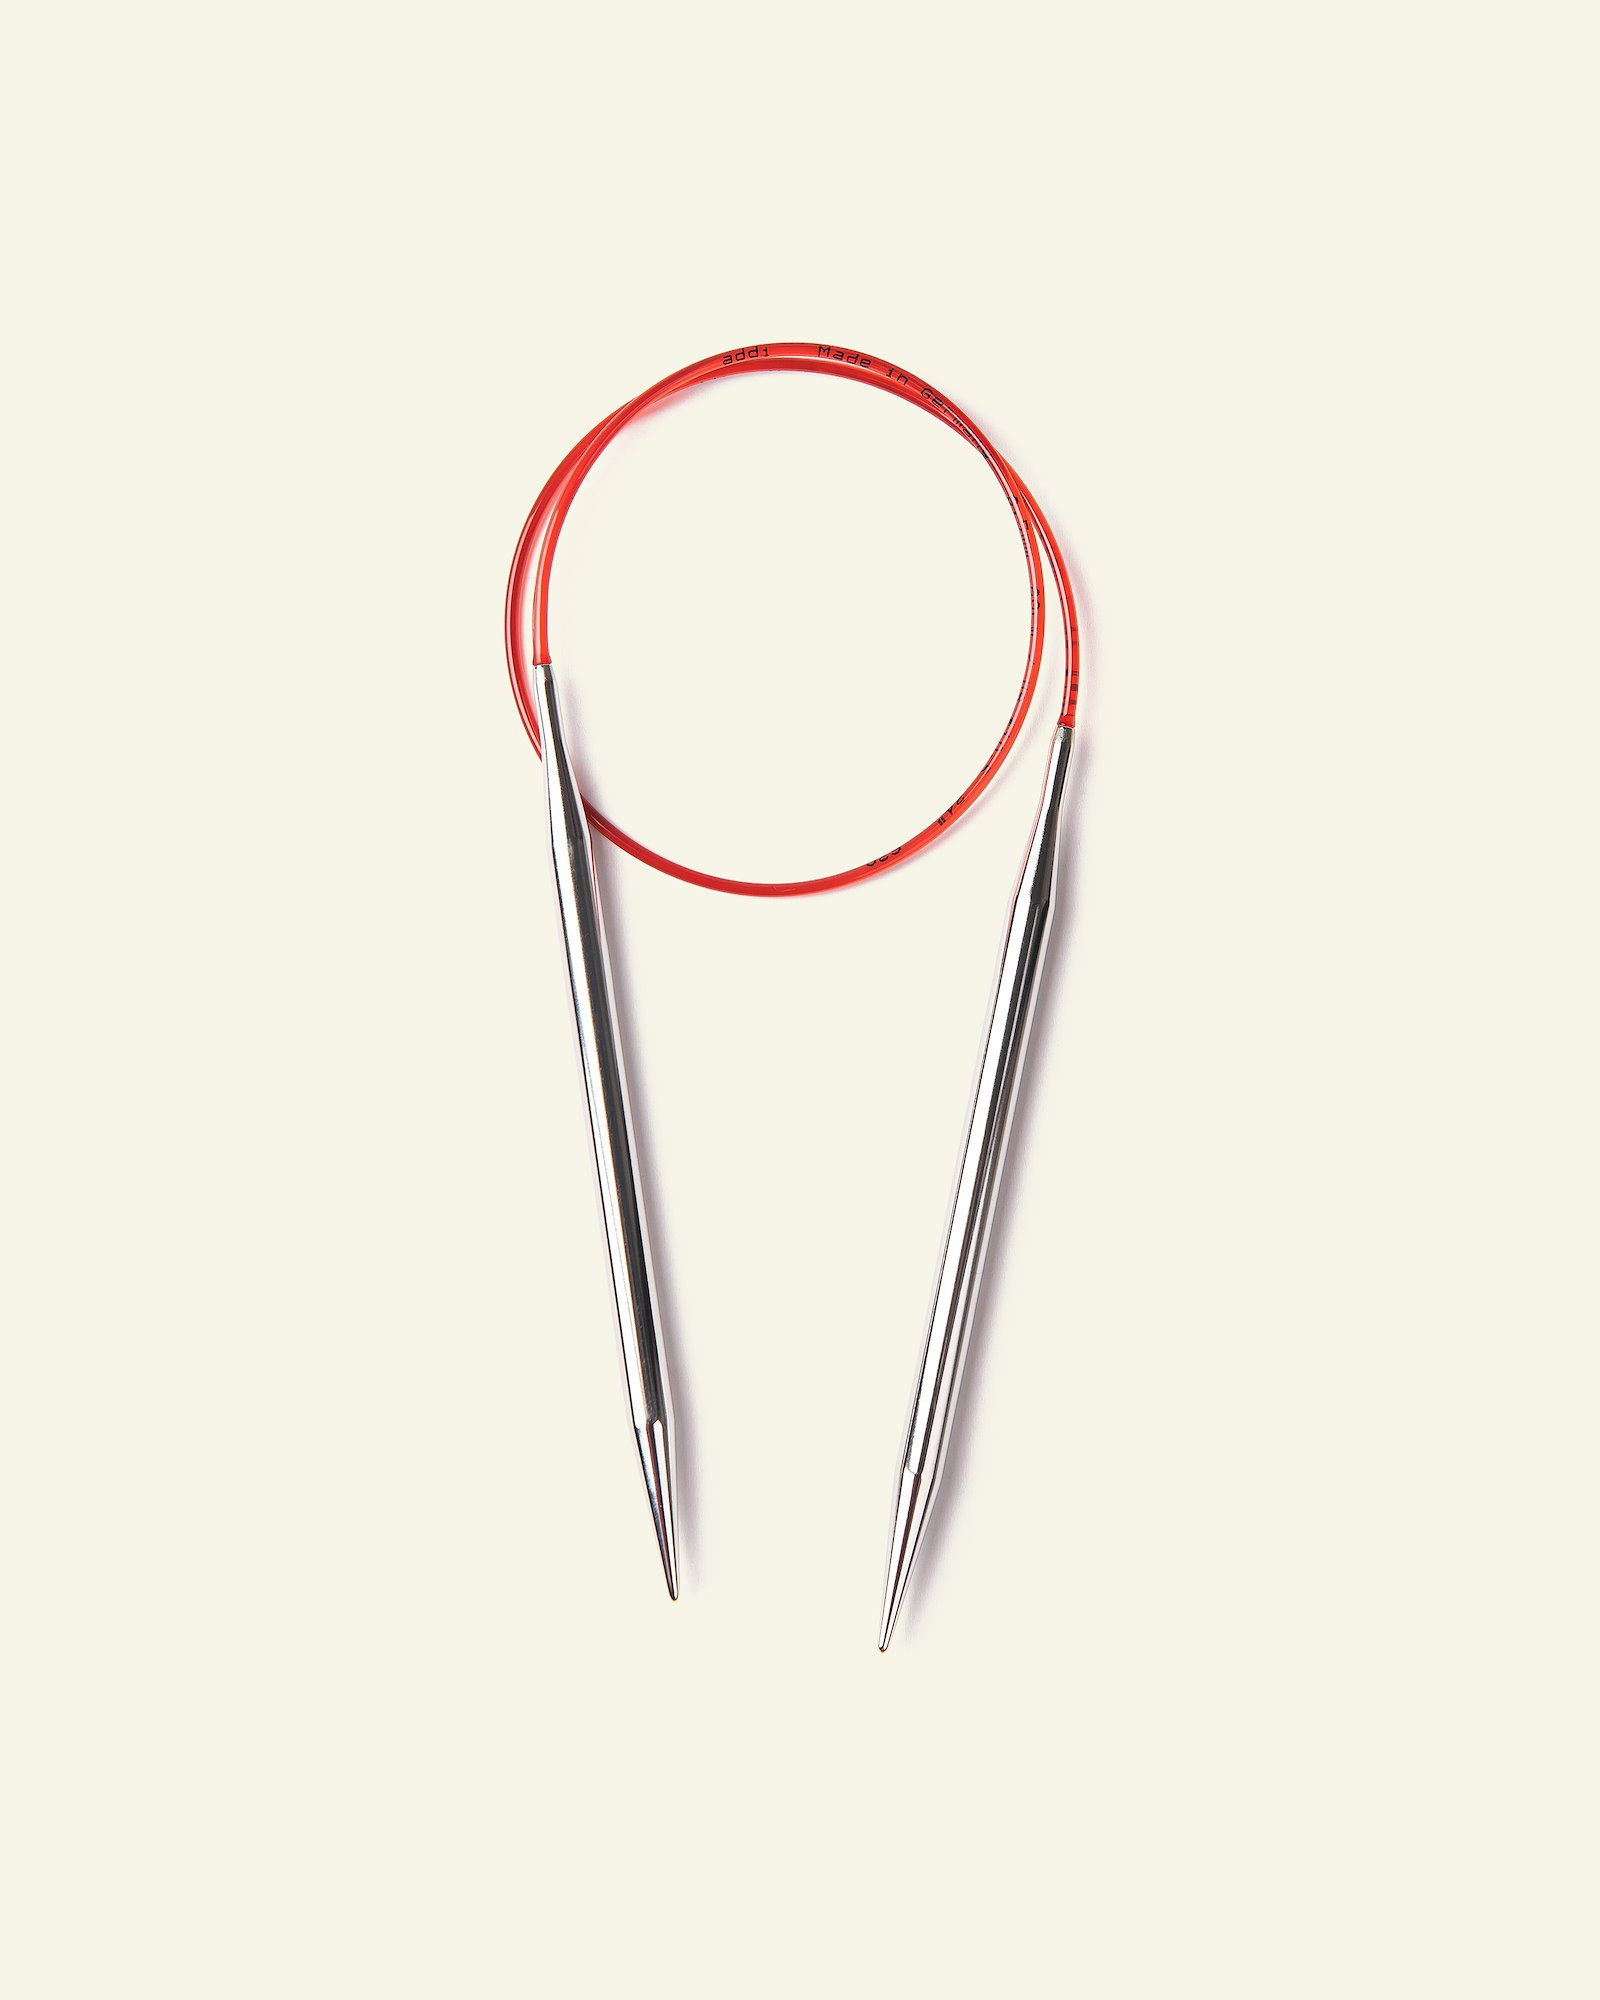 Addi Lace circular needle 60cm 5,5mm